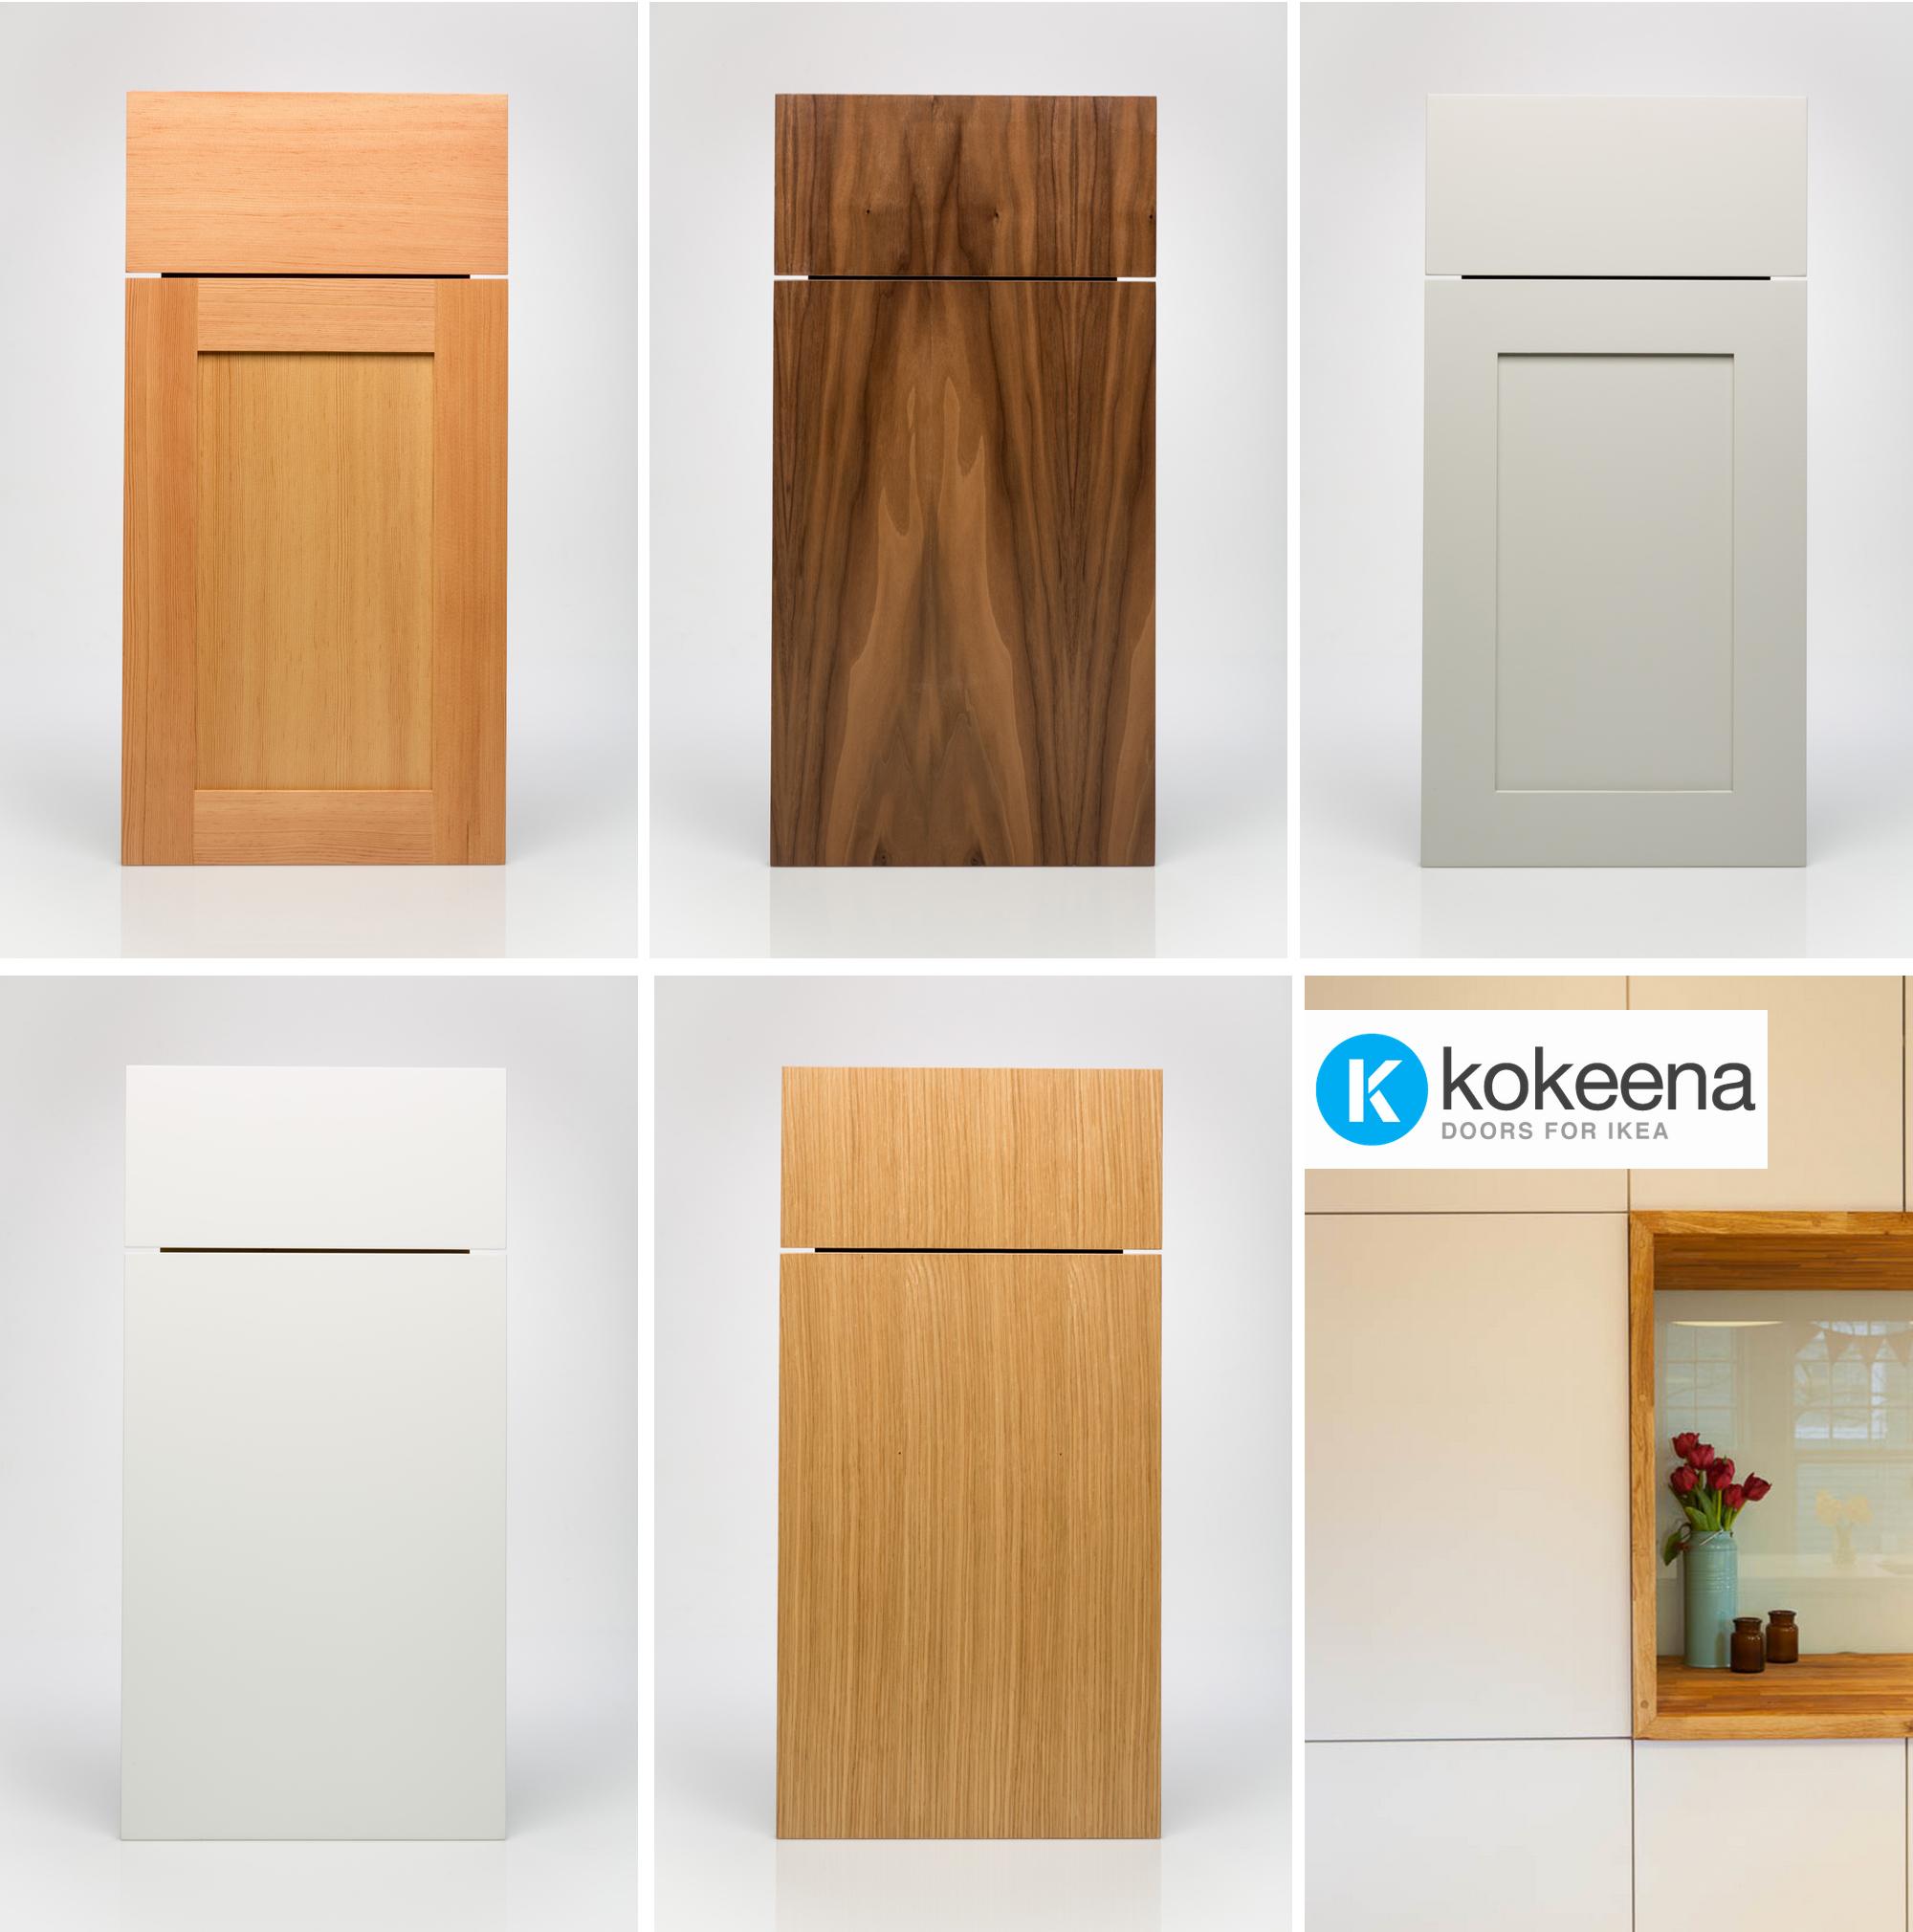 Cabinet Doors For Ikea Akurum